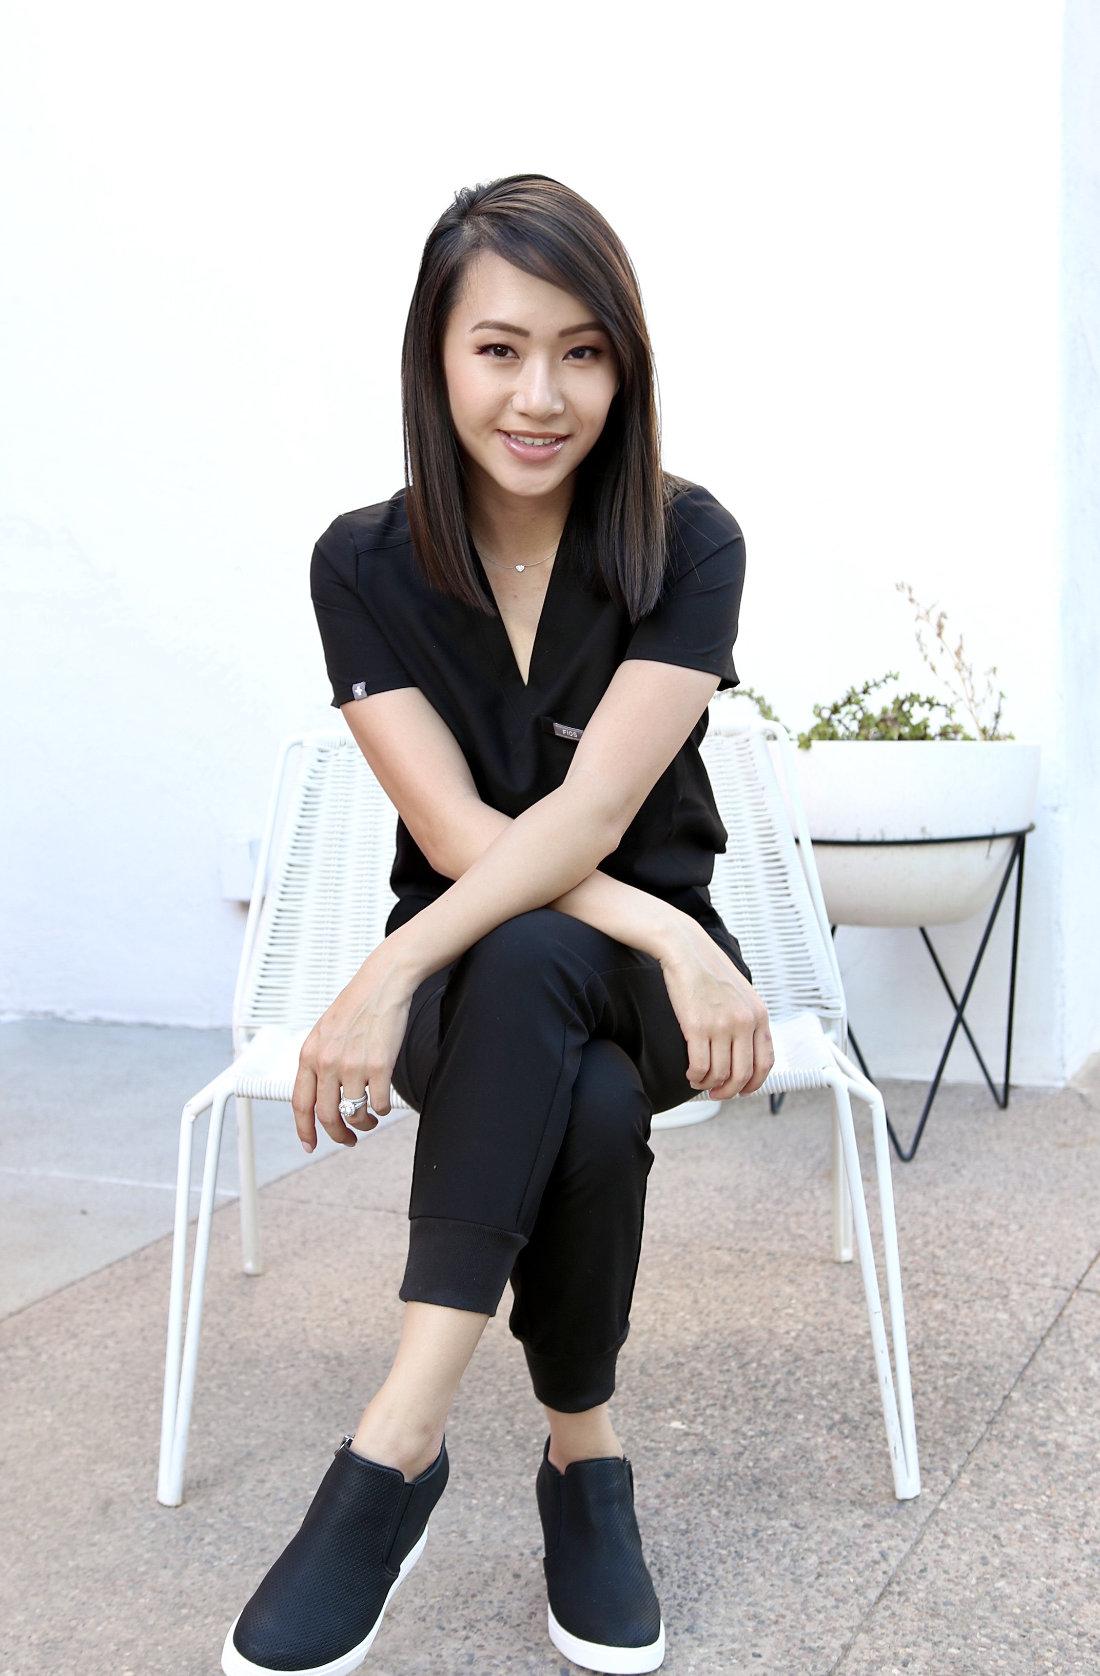 Meet the business owner of Lavish Beauty RN: Nancy Park, RN, BSN